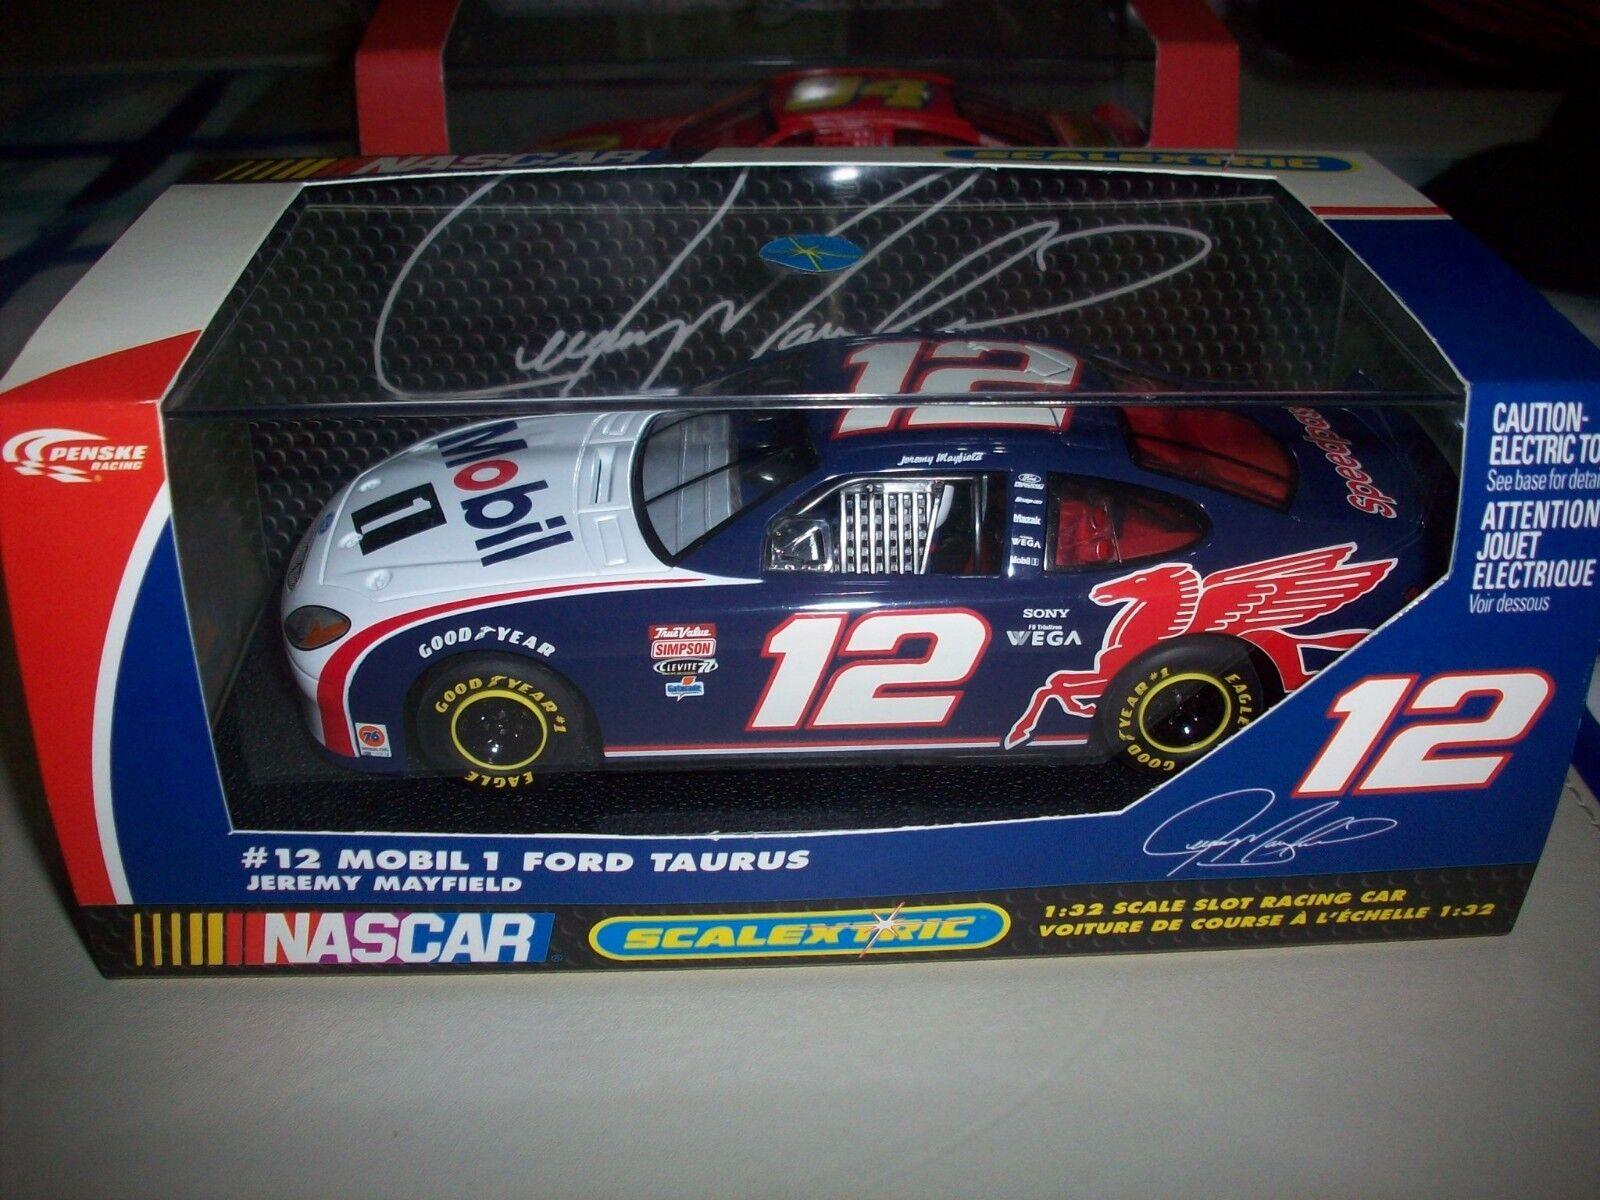 Scalextric Rare C2348 Mobil 1 Ford Taurus Jeremy Mayfield NMIB Nascar